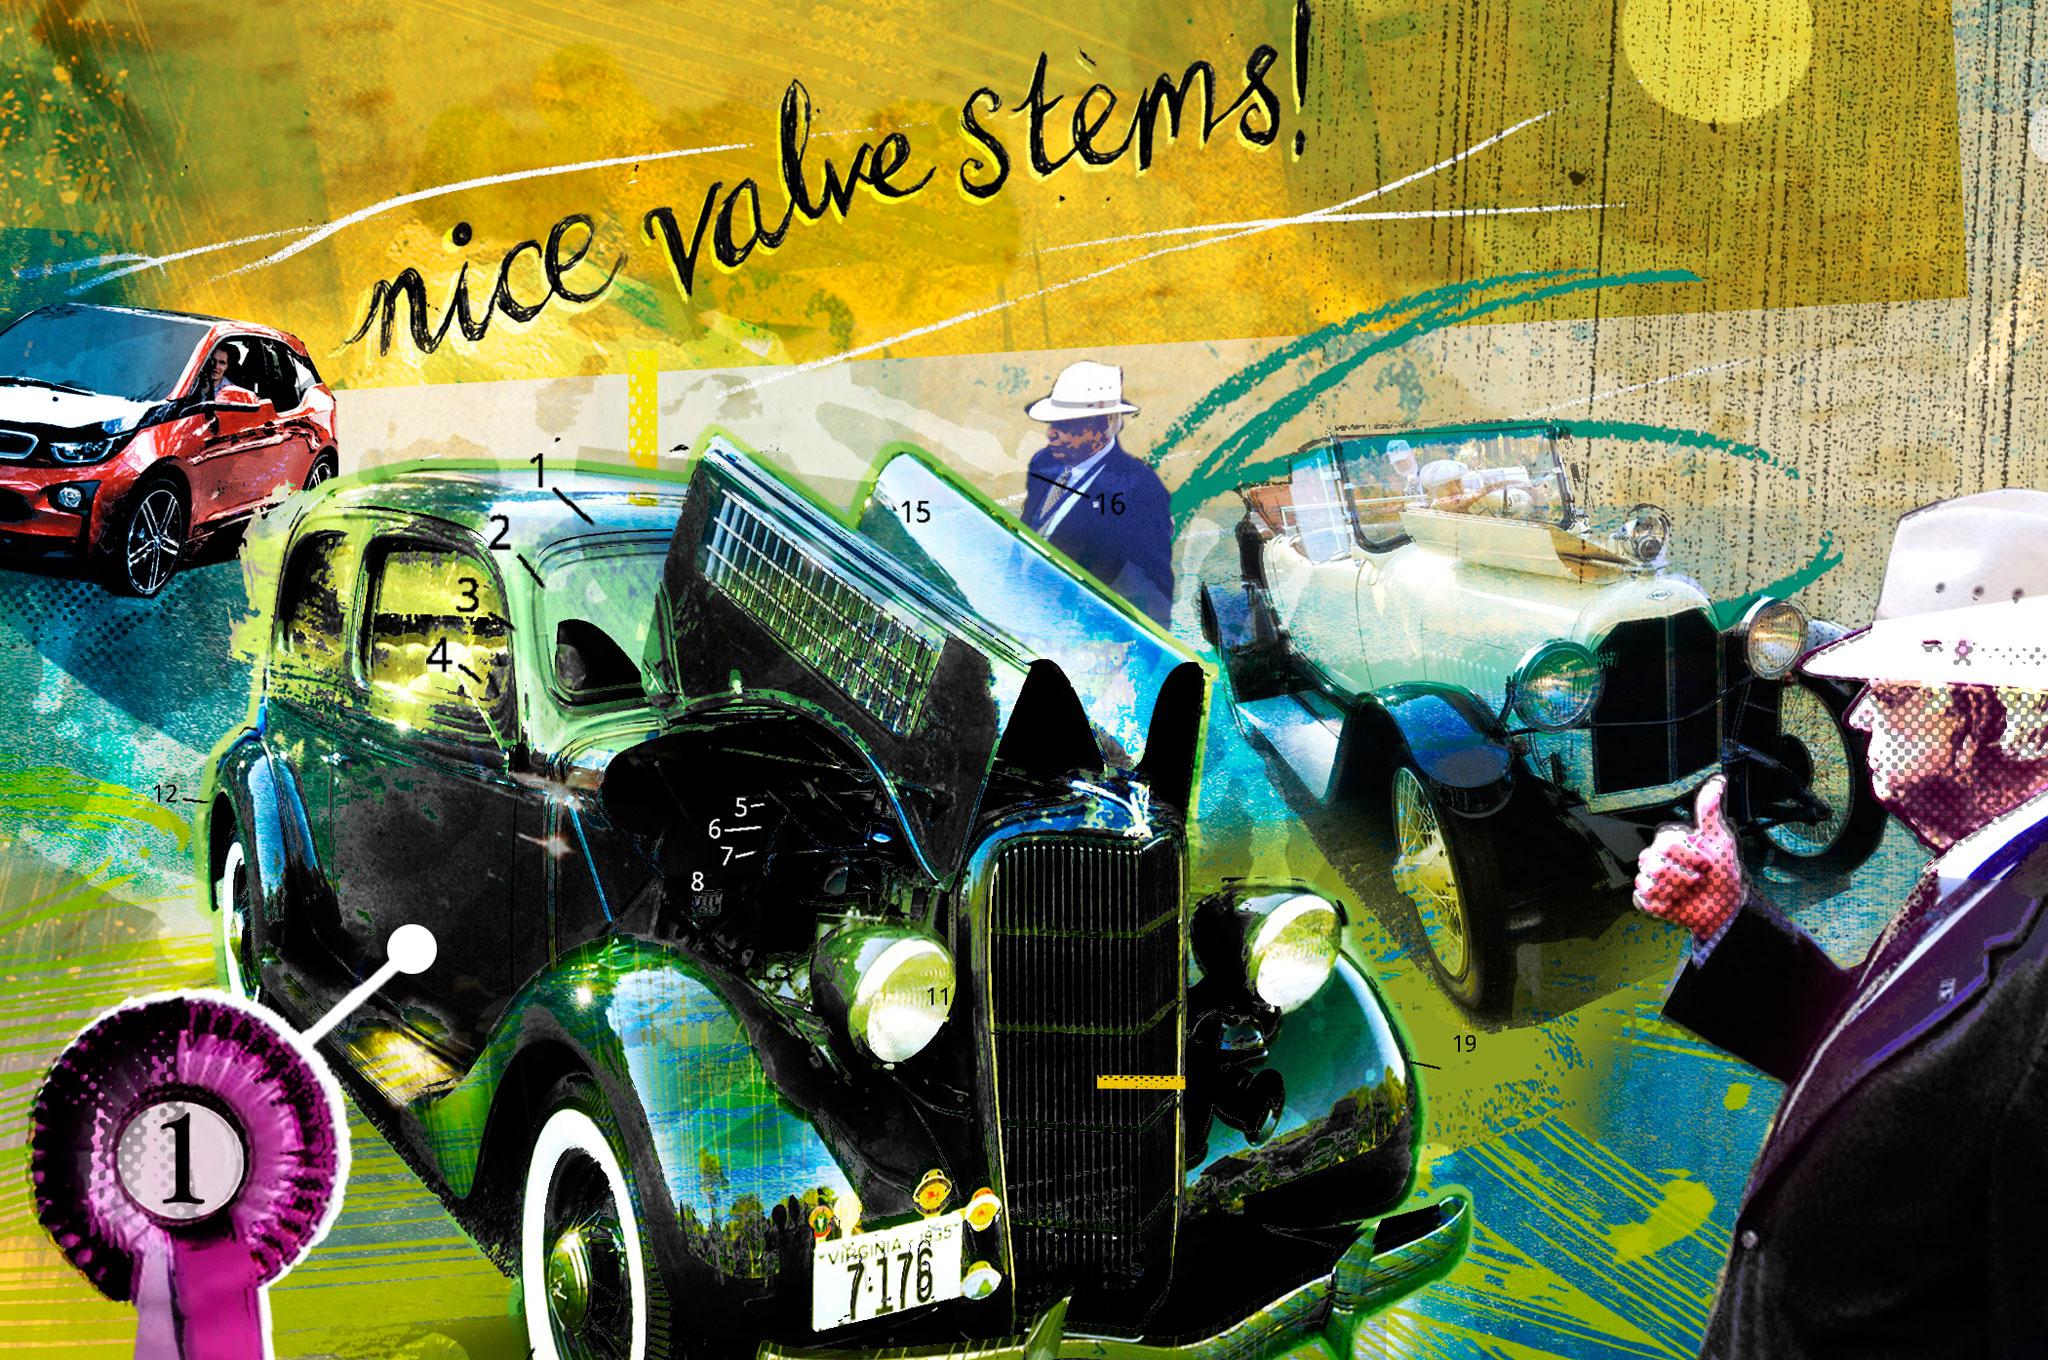 Nice Valve Stems Illustration Cropped